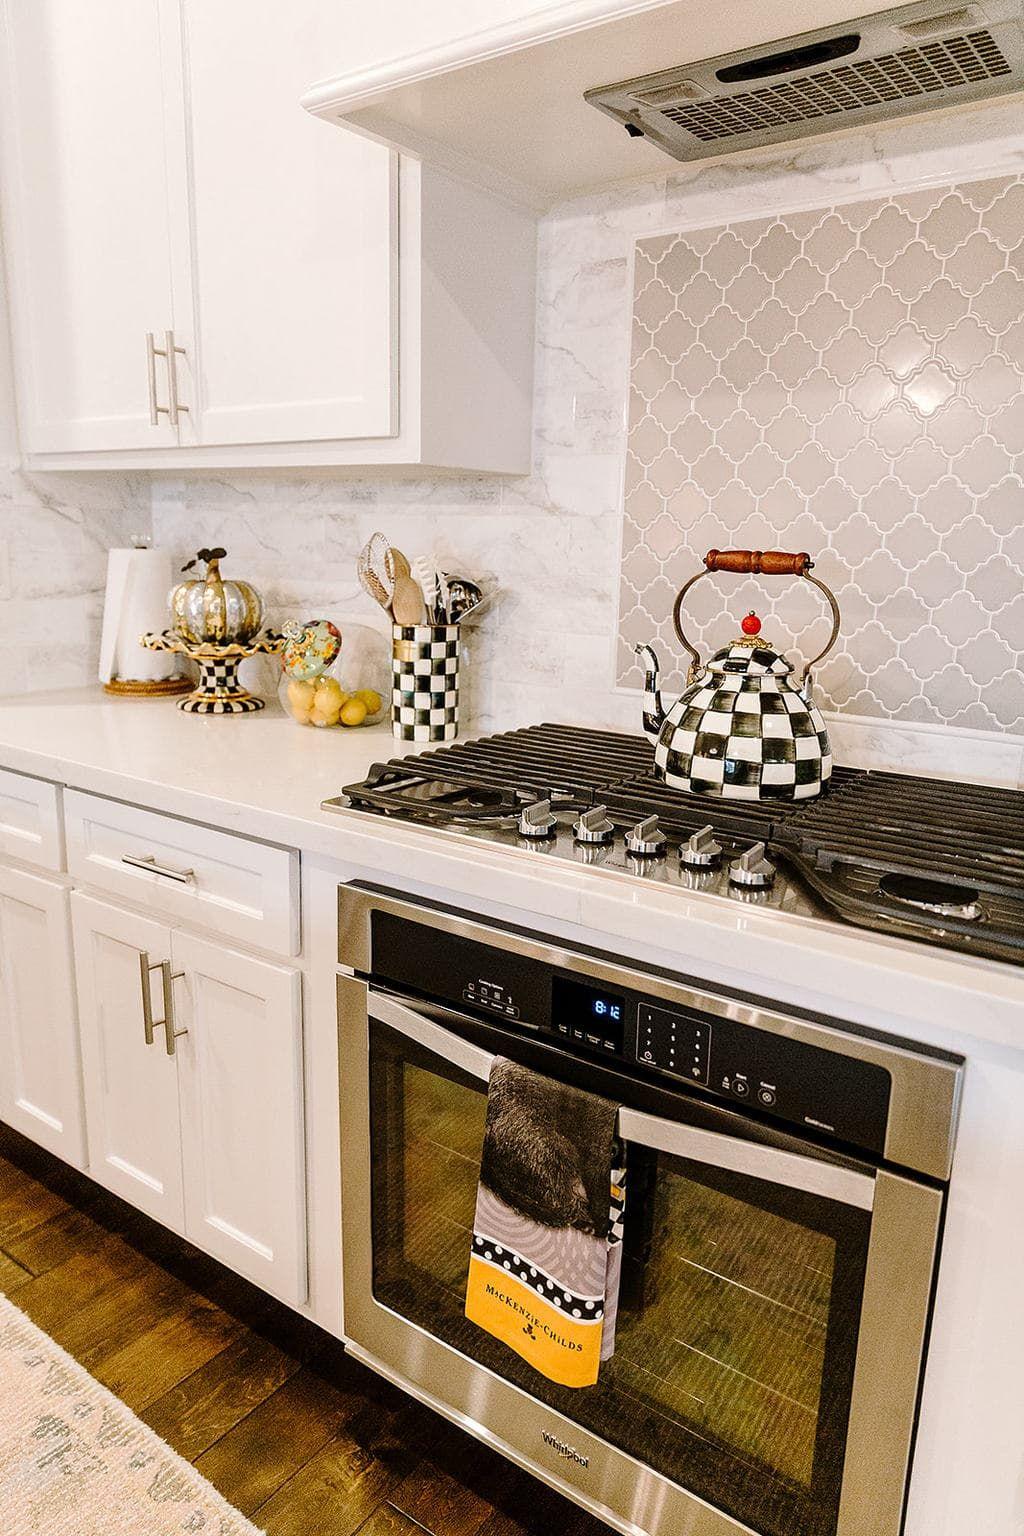 Courtly Check Sprinkled Around The Kitchen Counter Space Kitchen Furnishings Kitchen Counter Decor Kitchen Decor